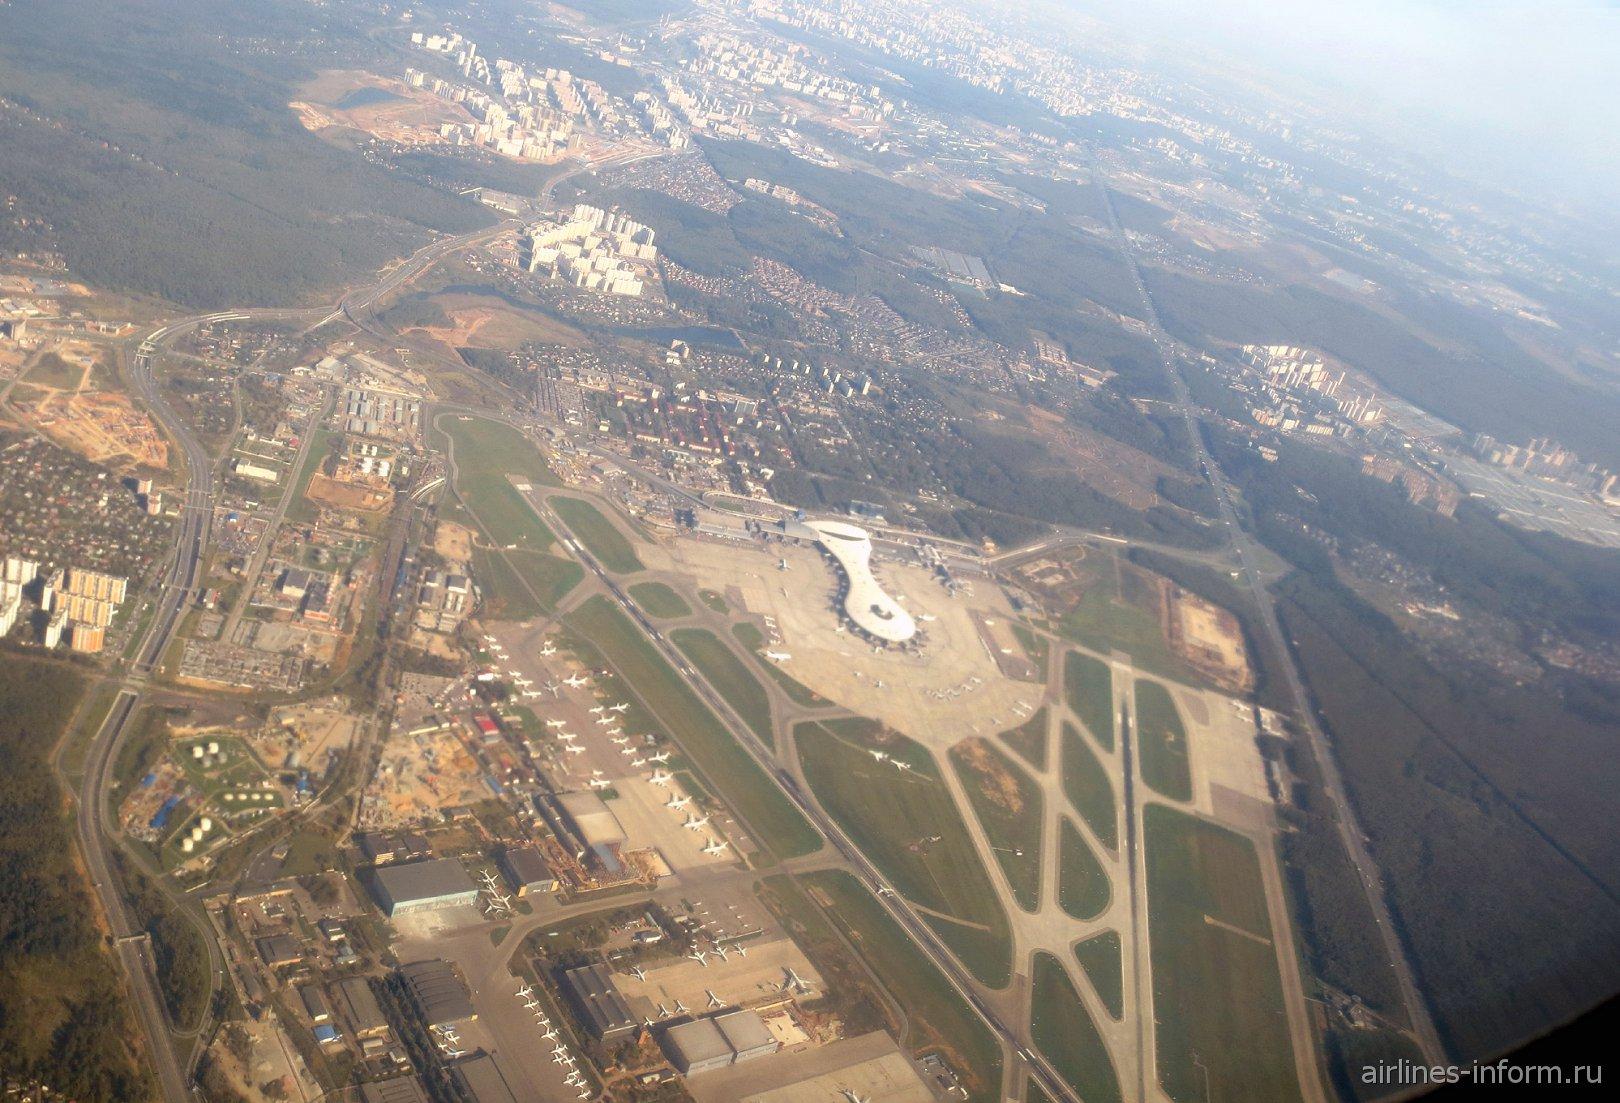 Аэровокзал аэропорта Москва Внуково